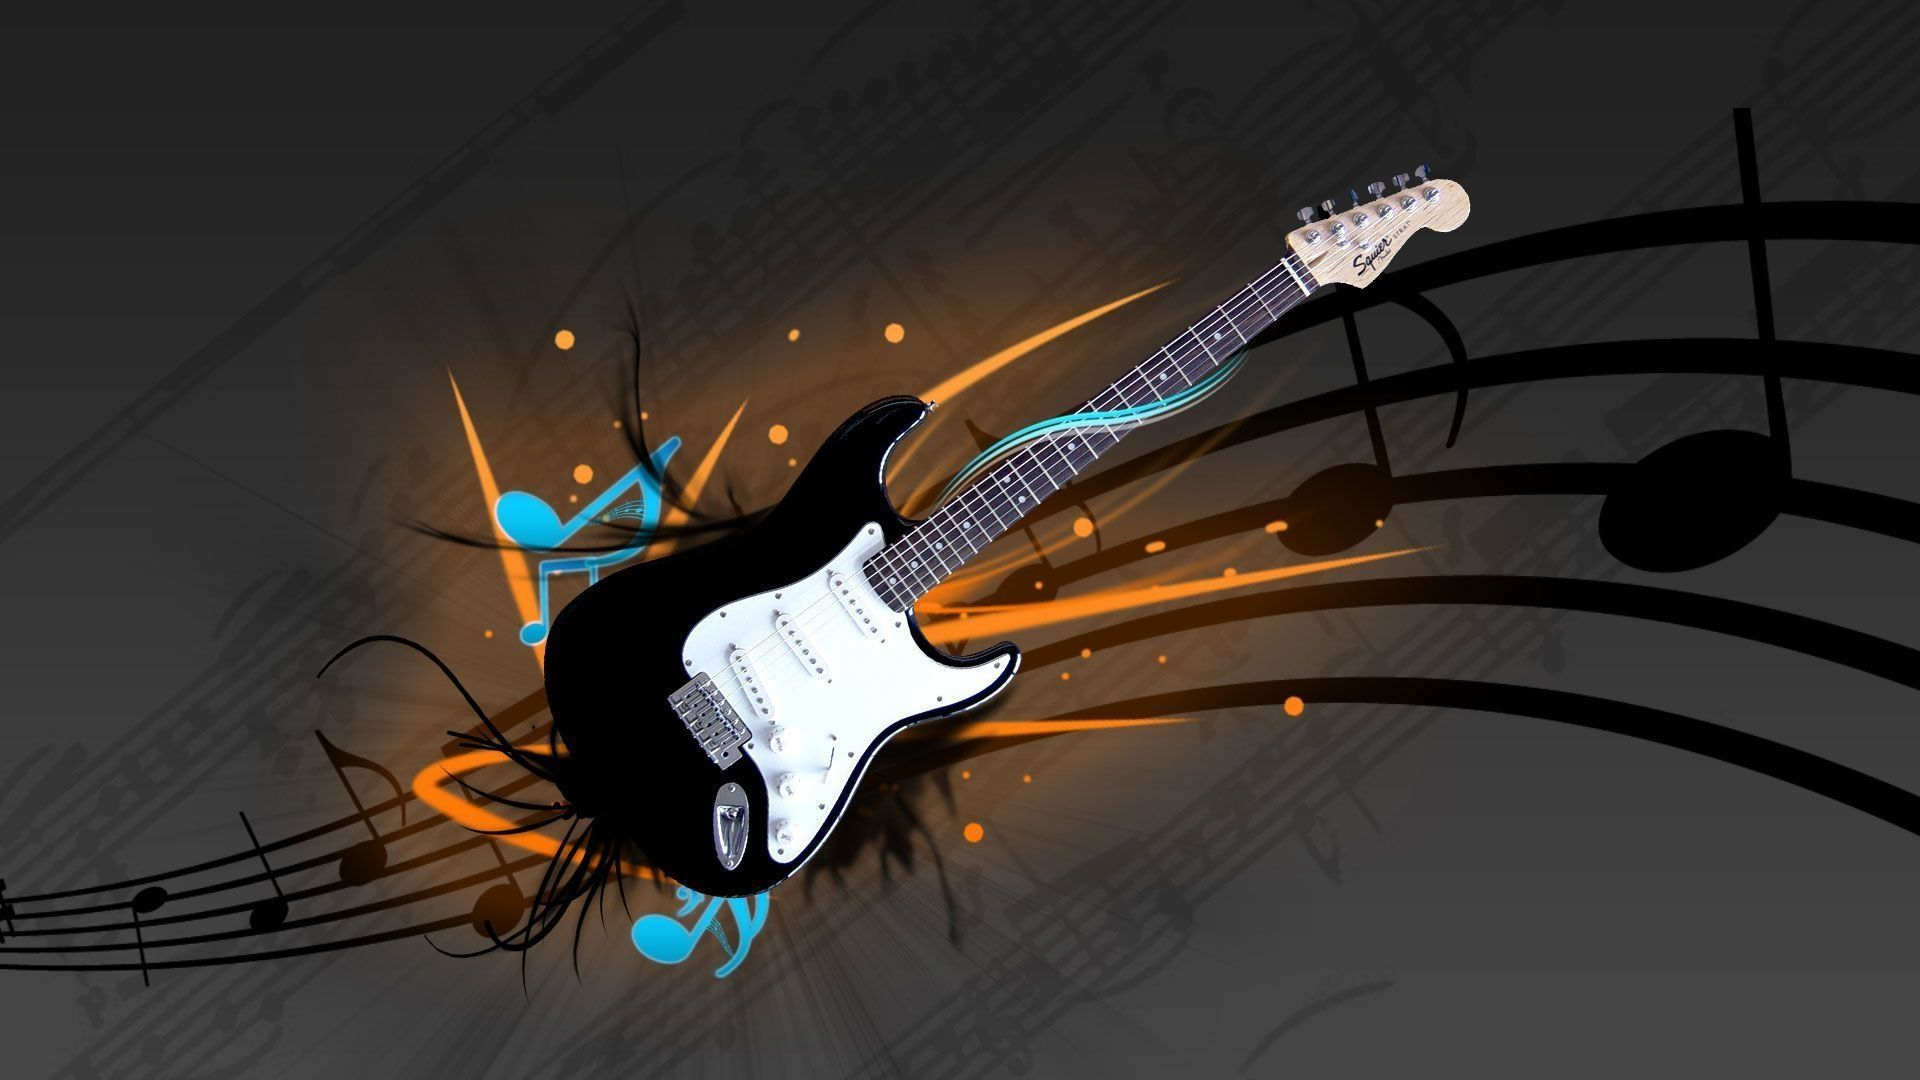 Guitar Abstract, Wallpaper Image